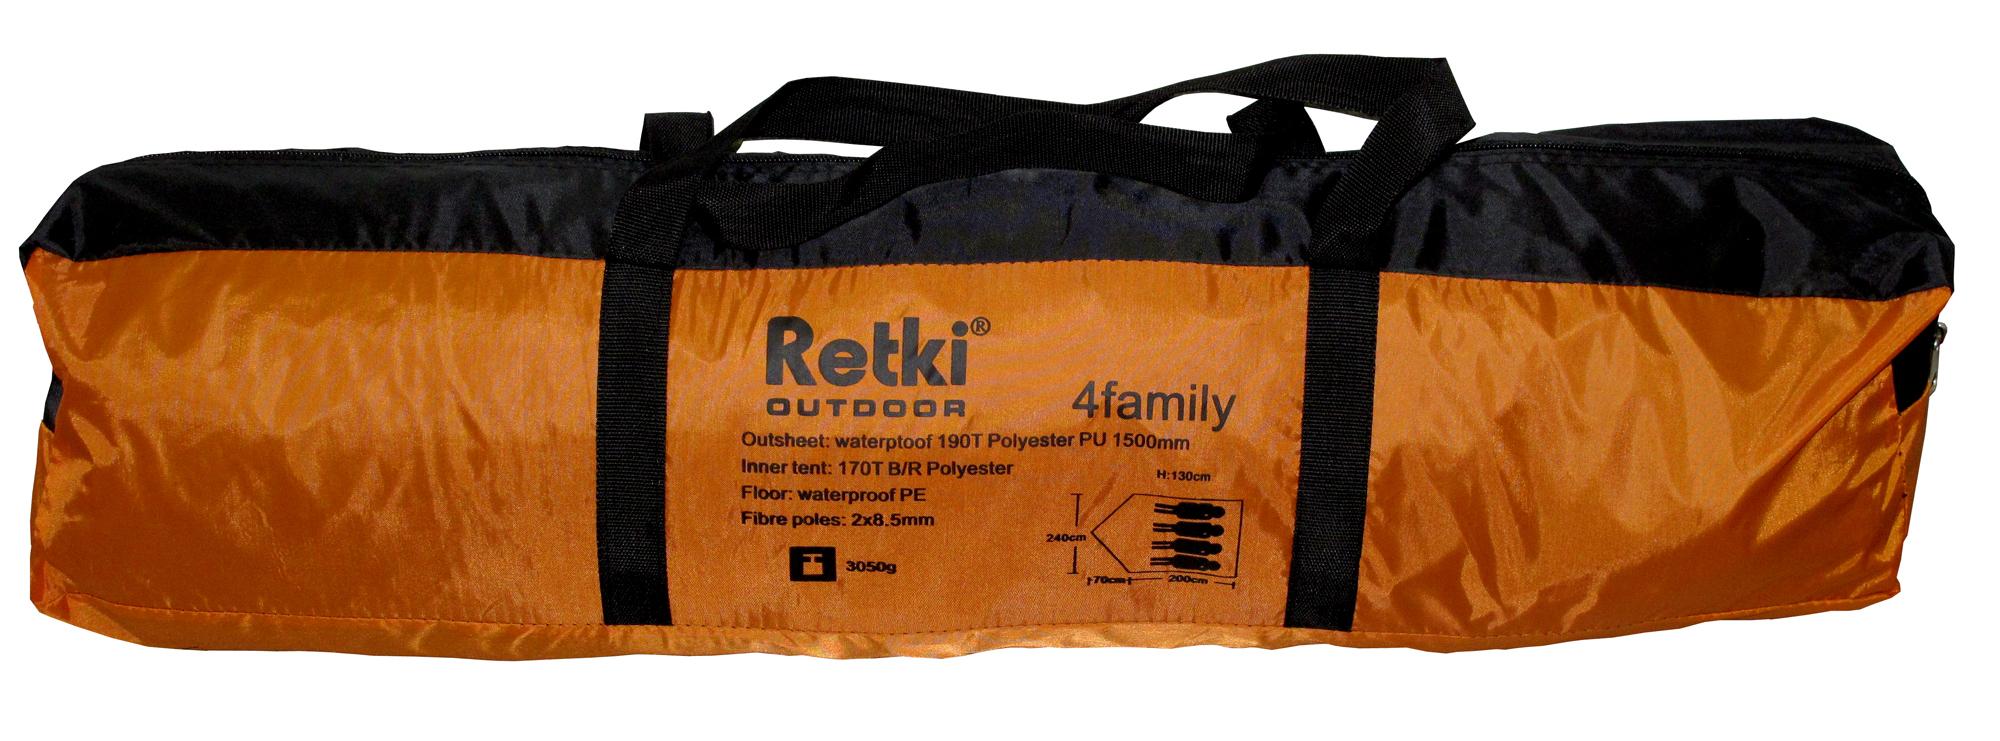 Retki 4Family teltta - Retki Finland 9fe78c67e8